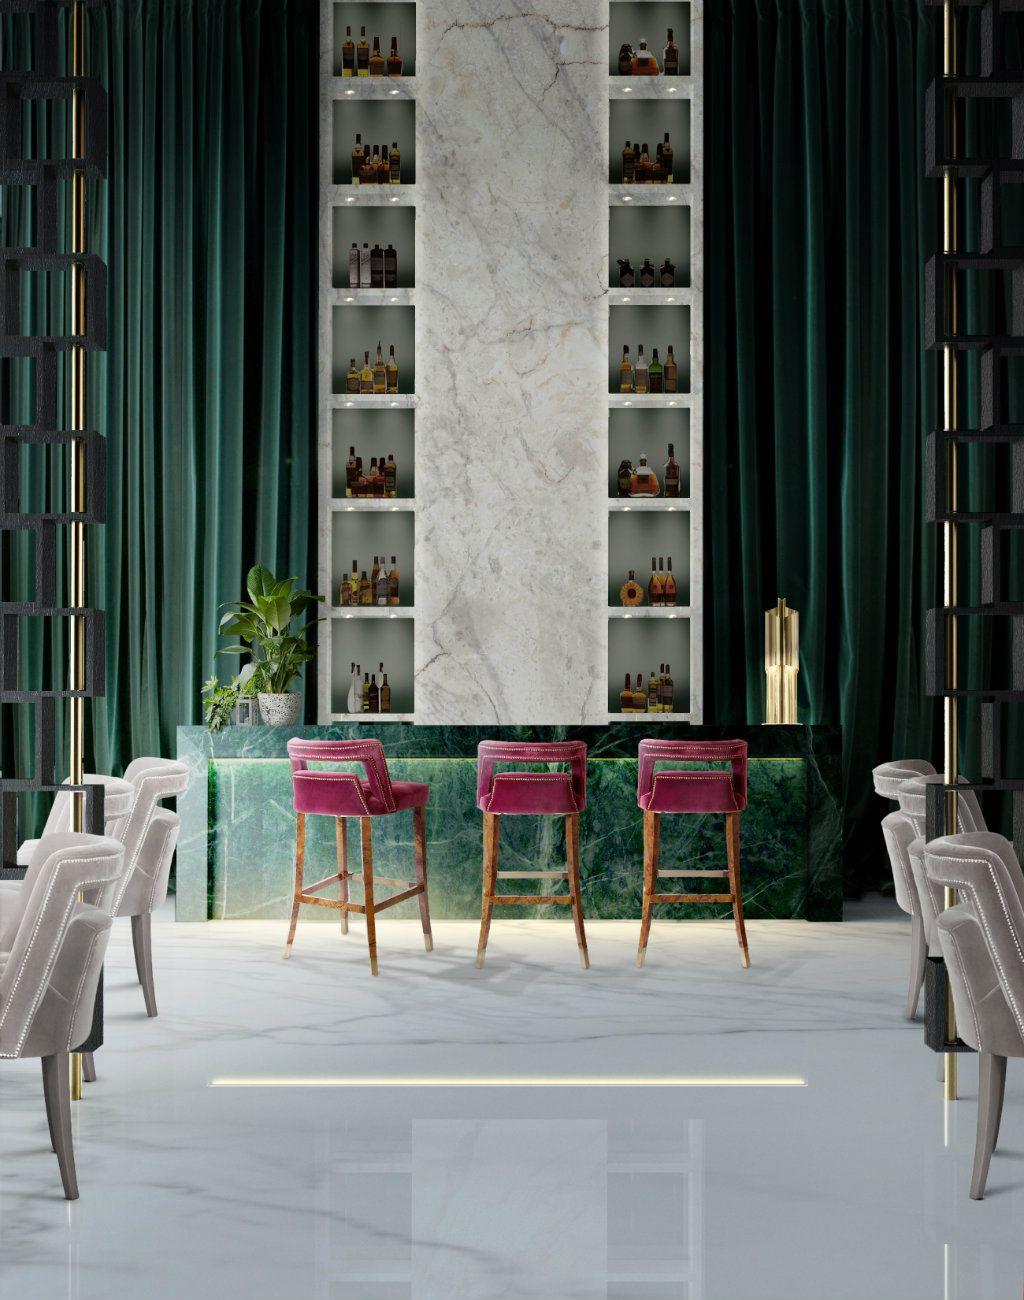 Bar decoration ideas with purple bar stools